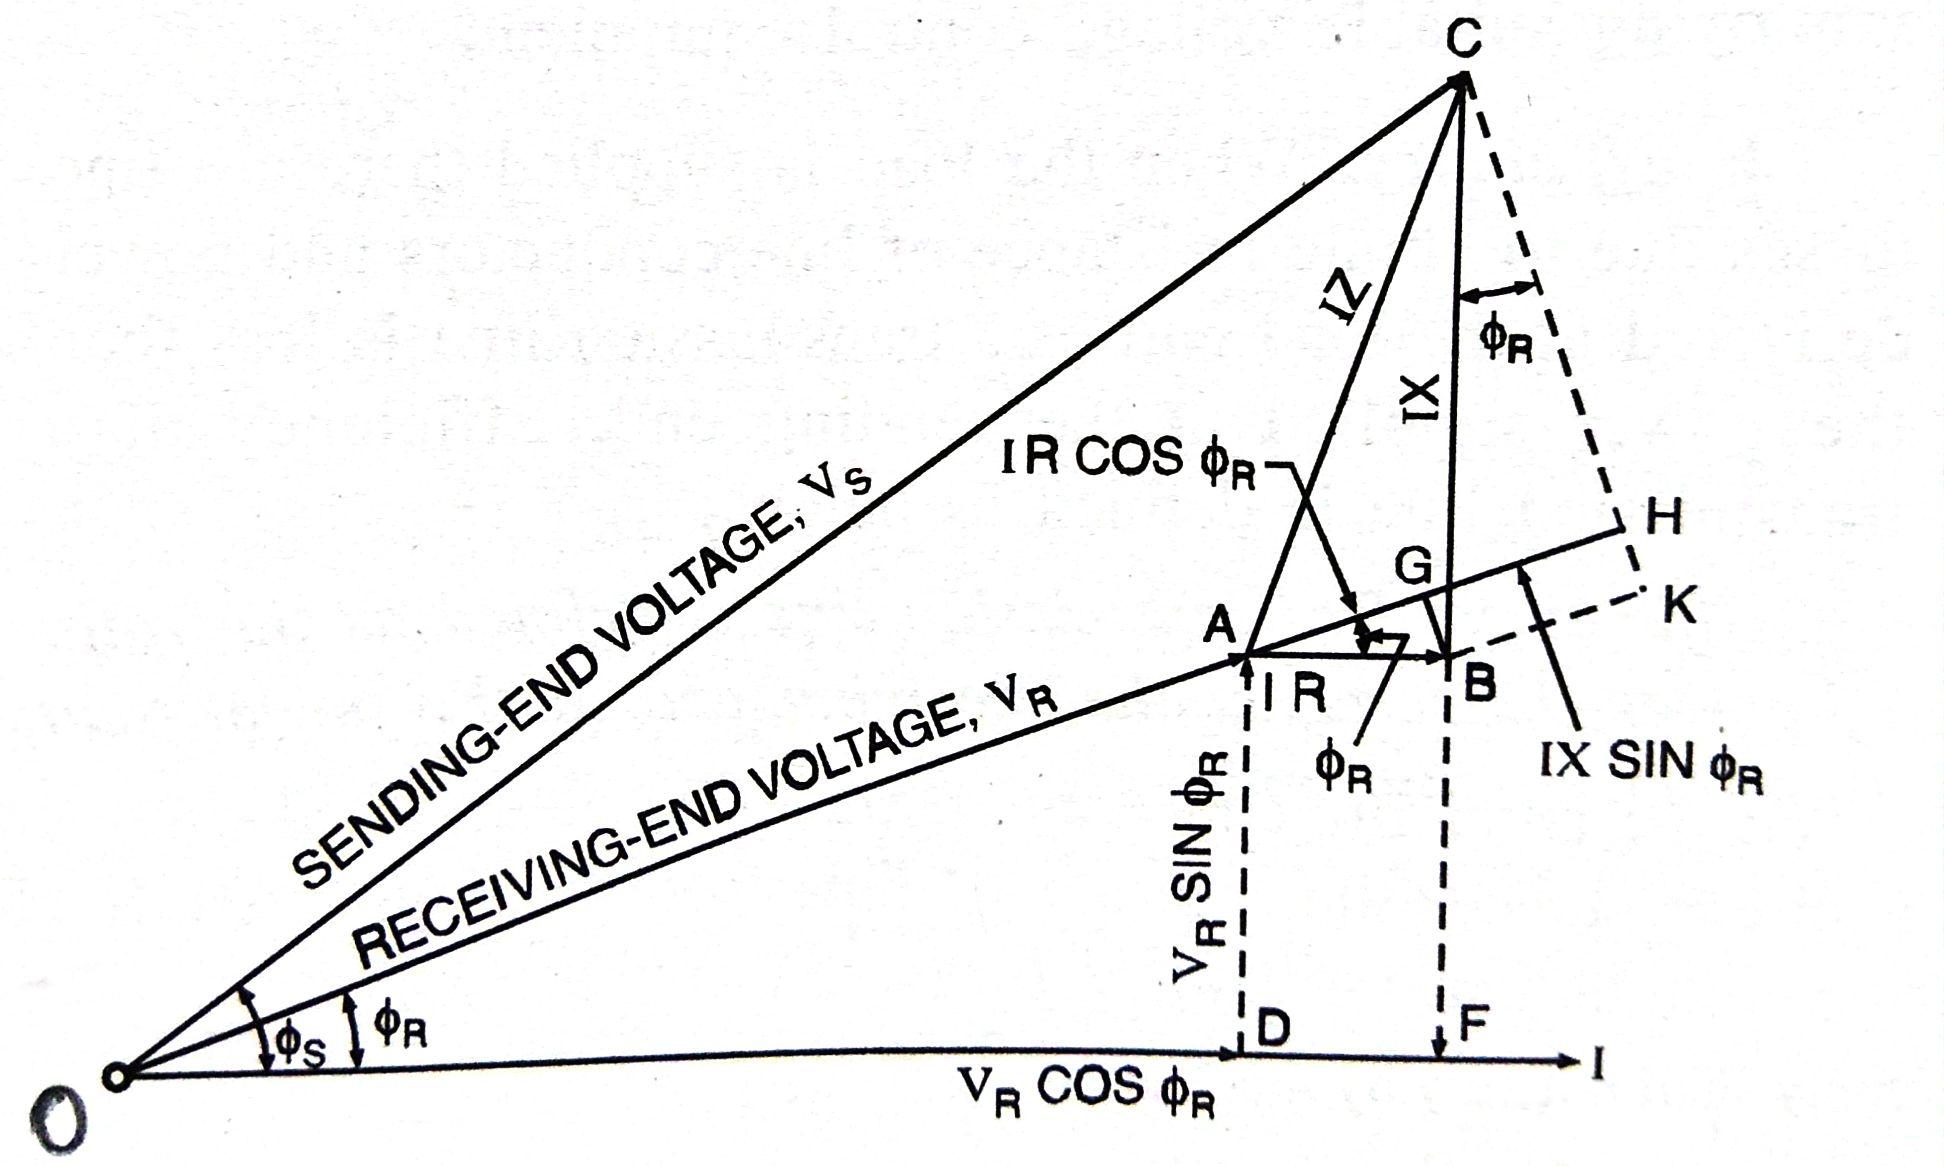 Phasor Diagram of Short Transmission Lines